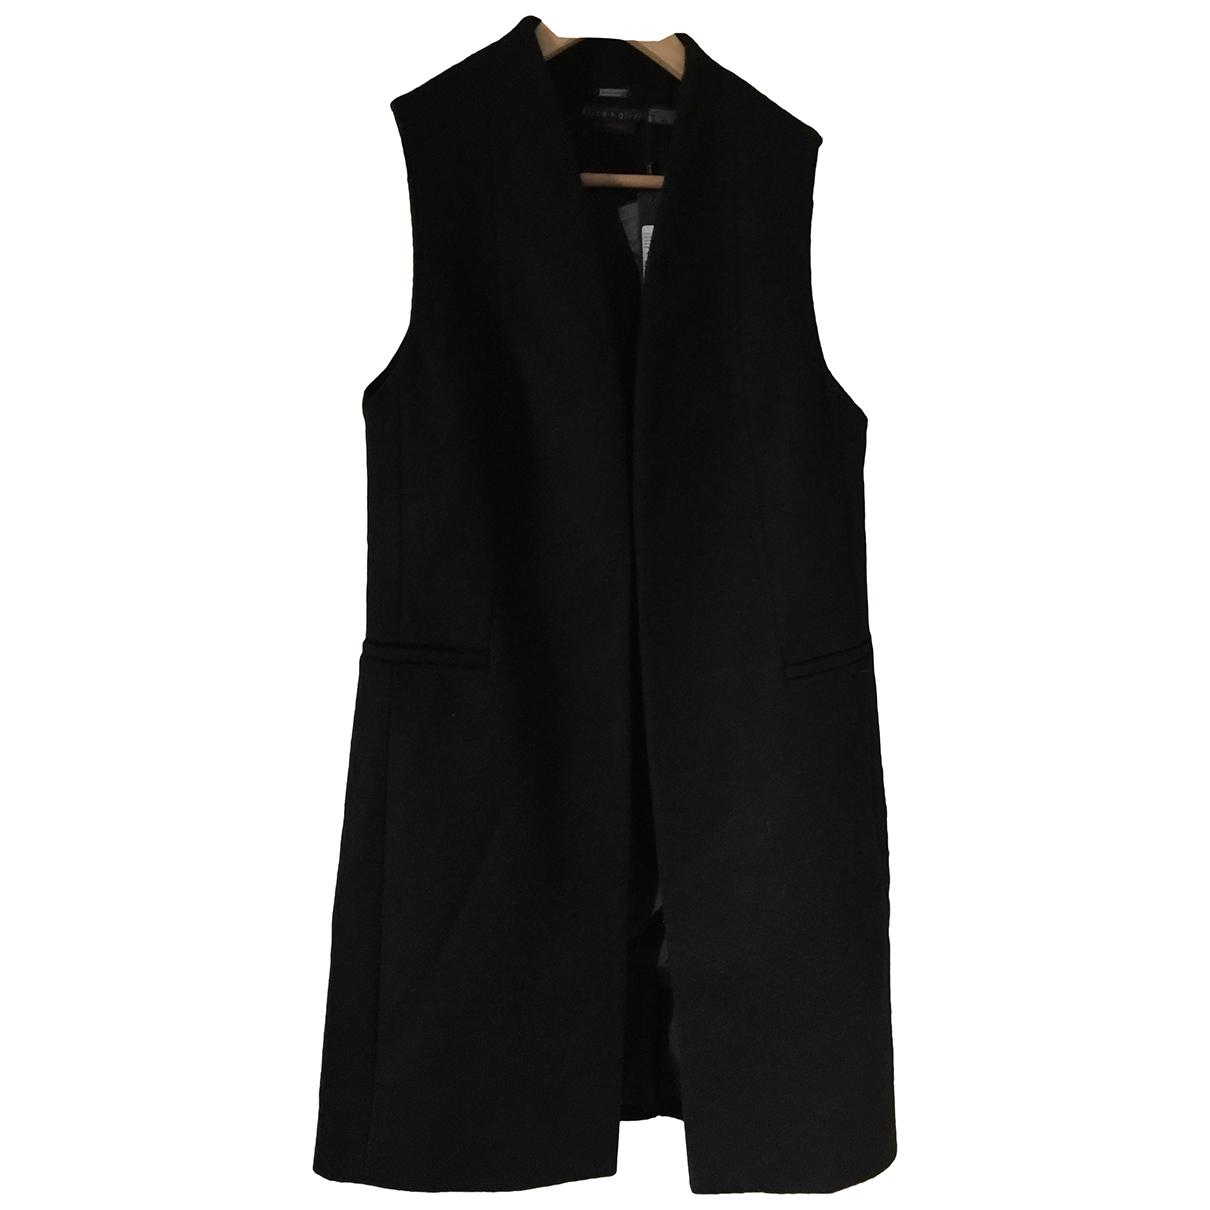 Alice & Olivia \N Black Wool coat for Women M International